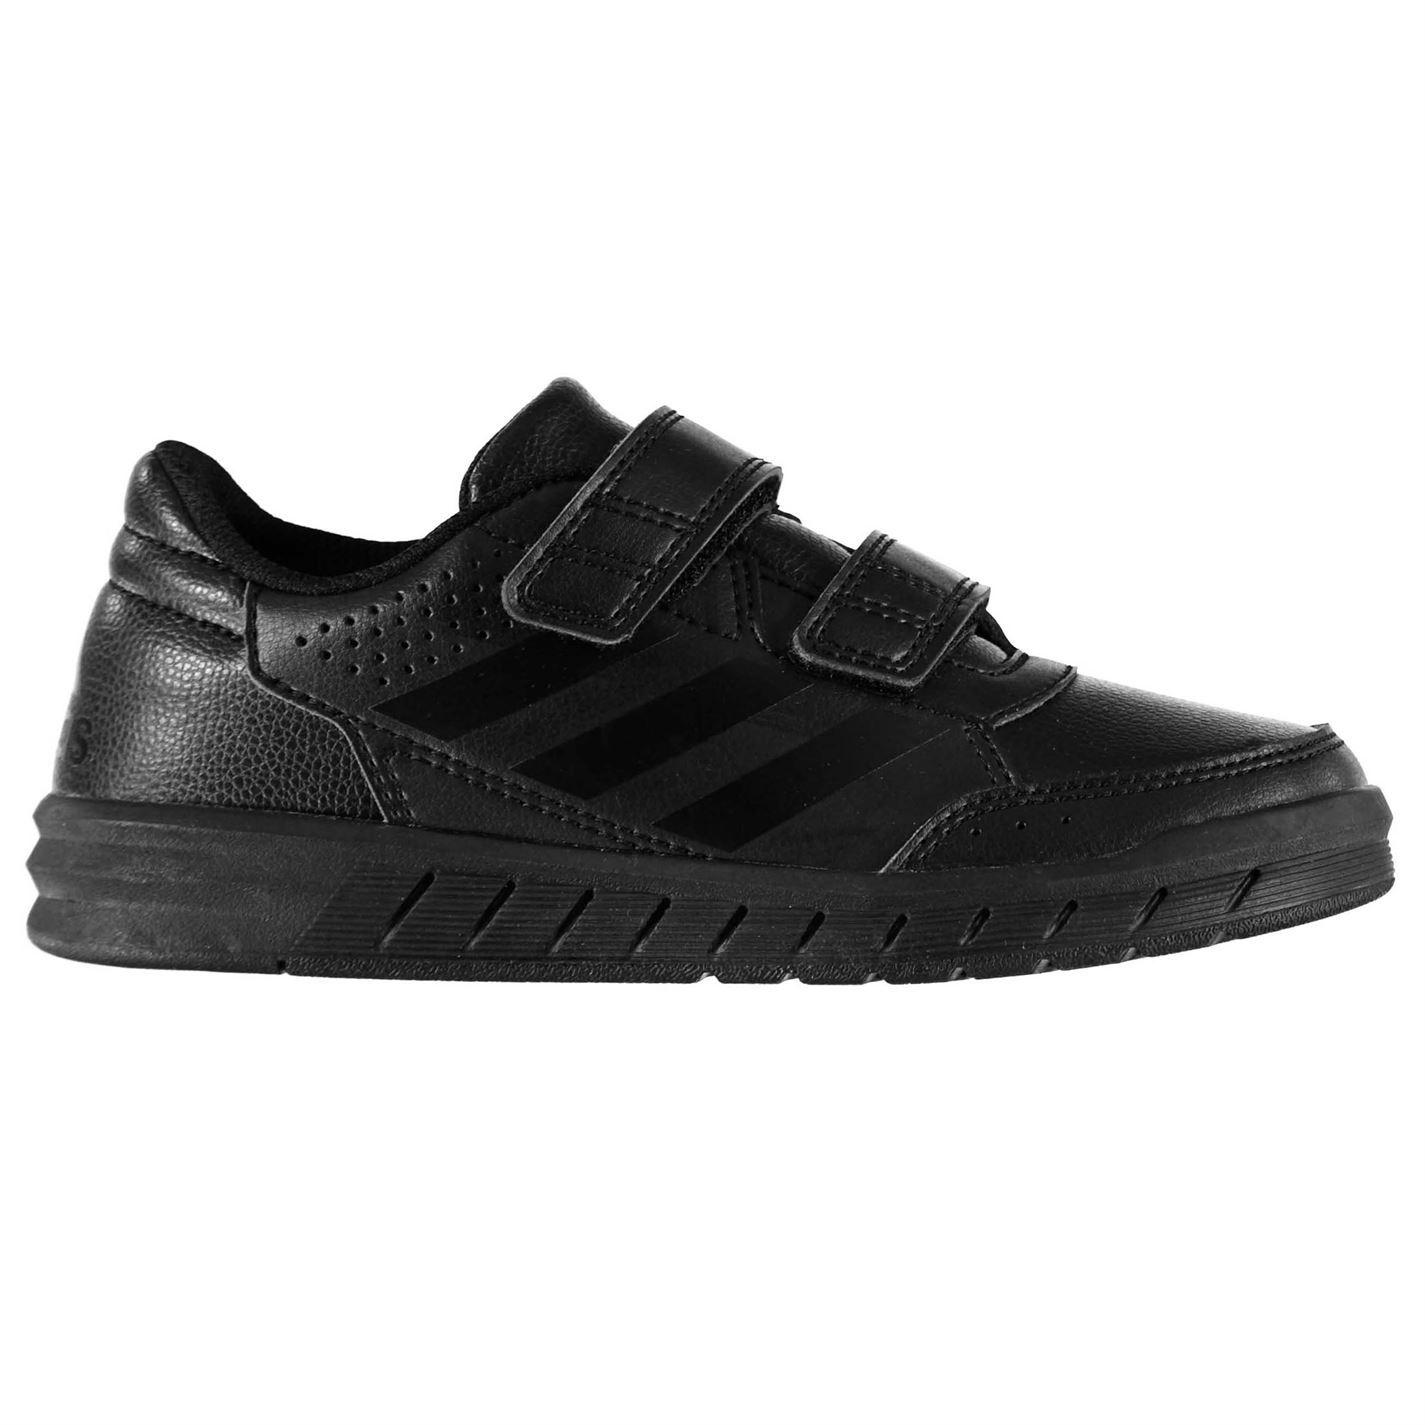 miniatura 3 - ADIDAS-alta-Sport-CF-Scarpe-da-ginnastica-bambino-ragazzo-calzature